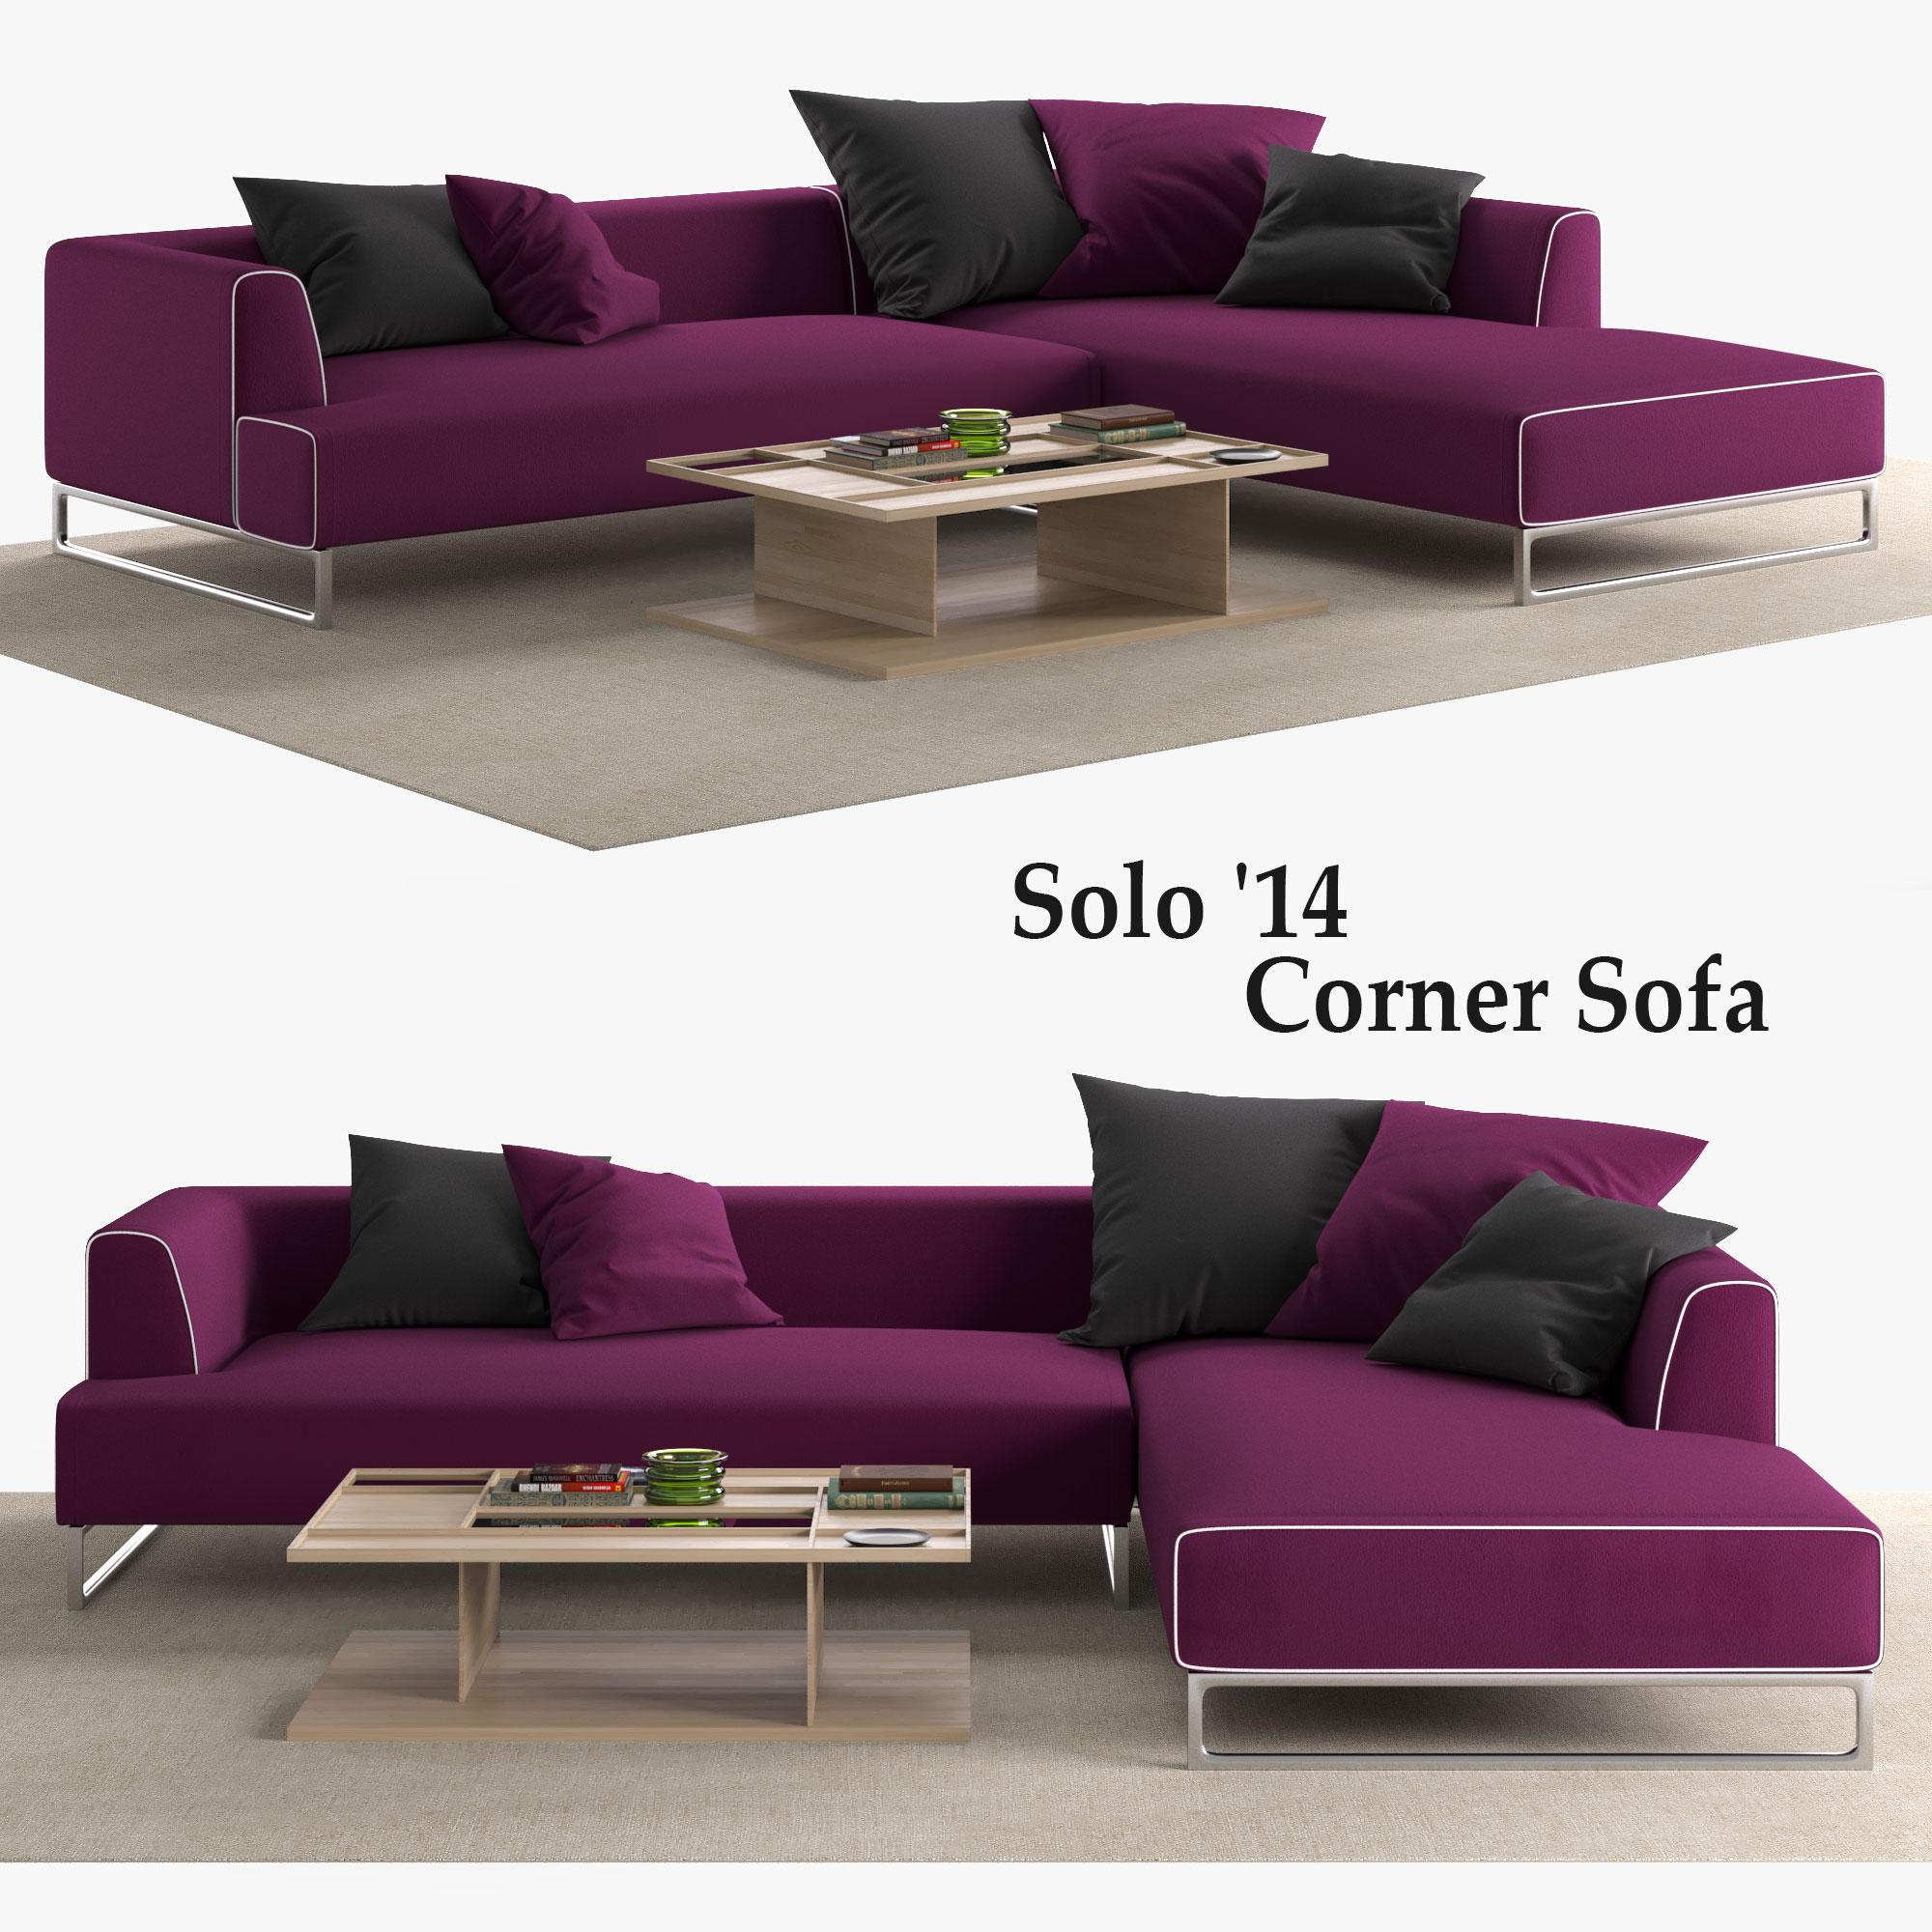 Awe Inspiring Solo 14 Corner Sofa Ibusinesslaw Wood Chair Design Ideas Ibusinesslaworg